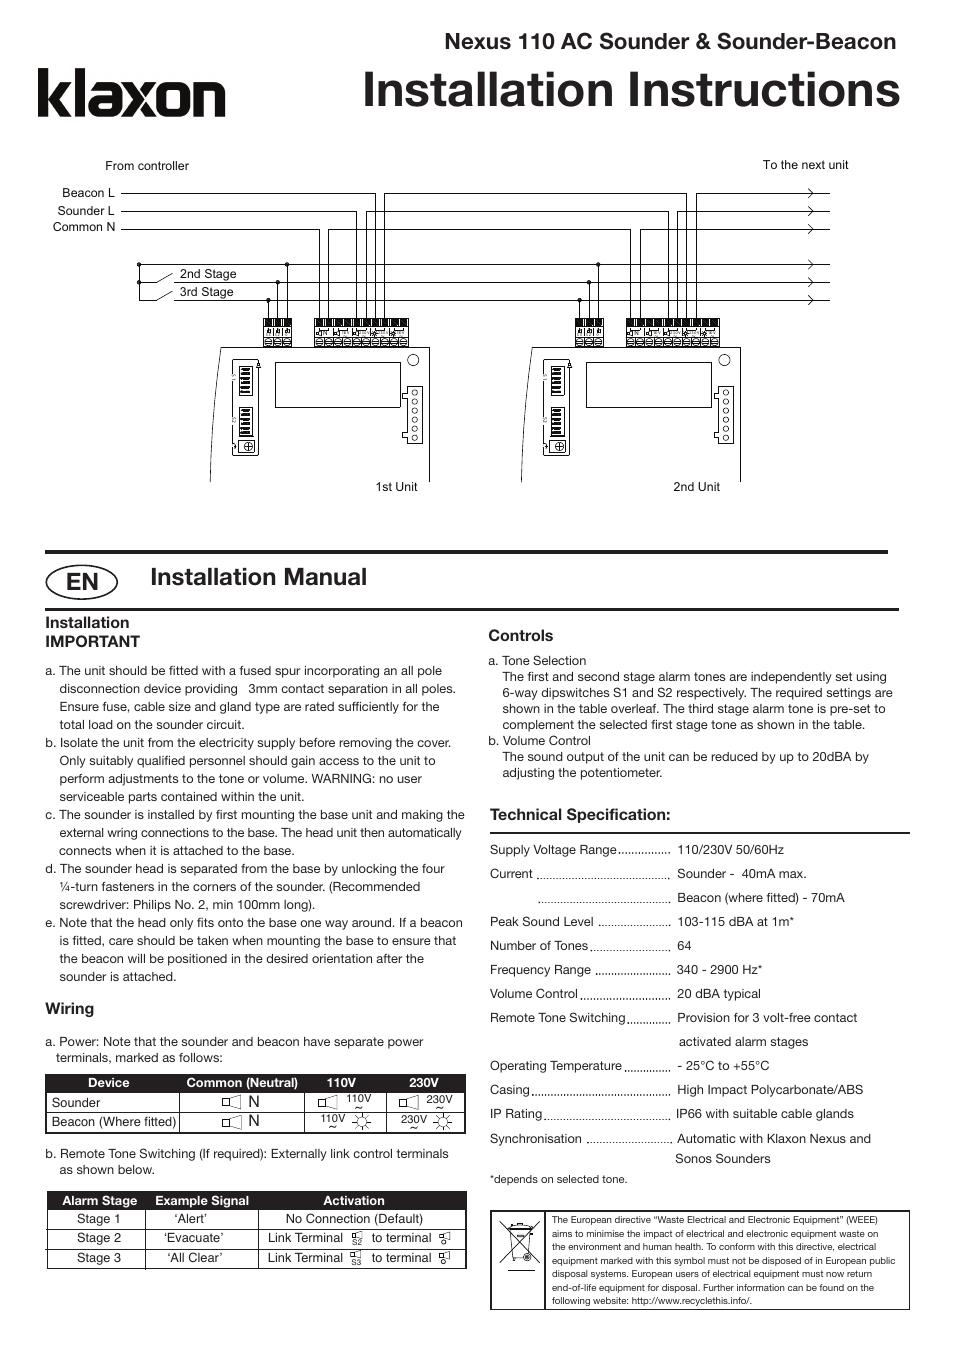 Nexos english 110 ac _layout 1, Installation instructions, Installation  manual | Nexus 110 ac